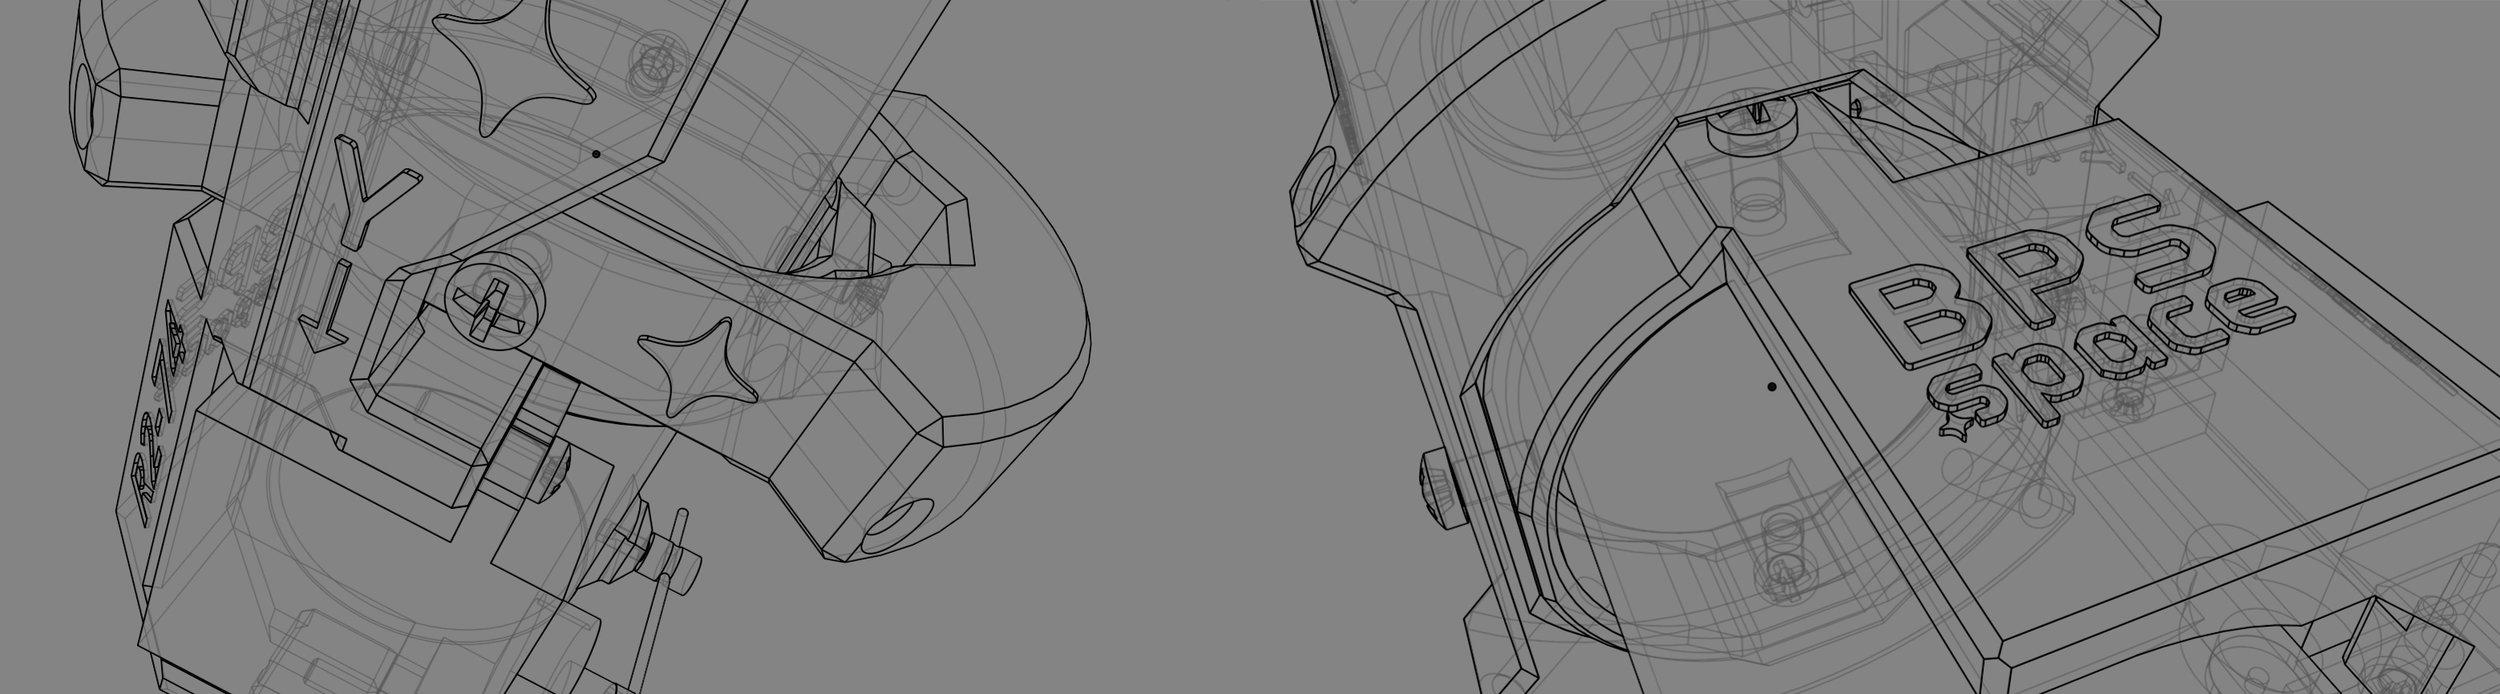 Thrust Vector Control -